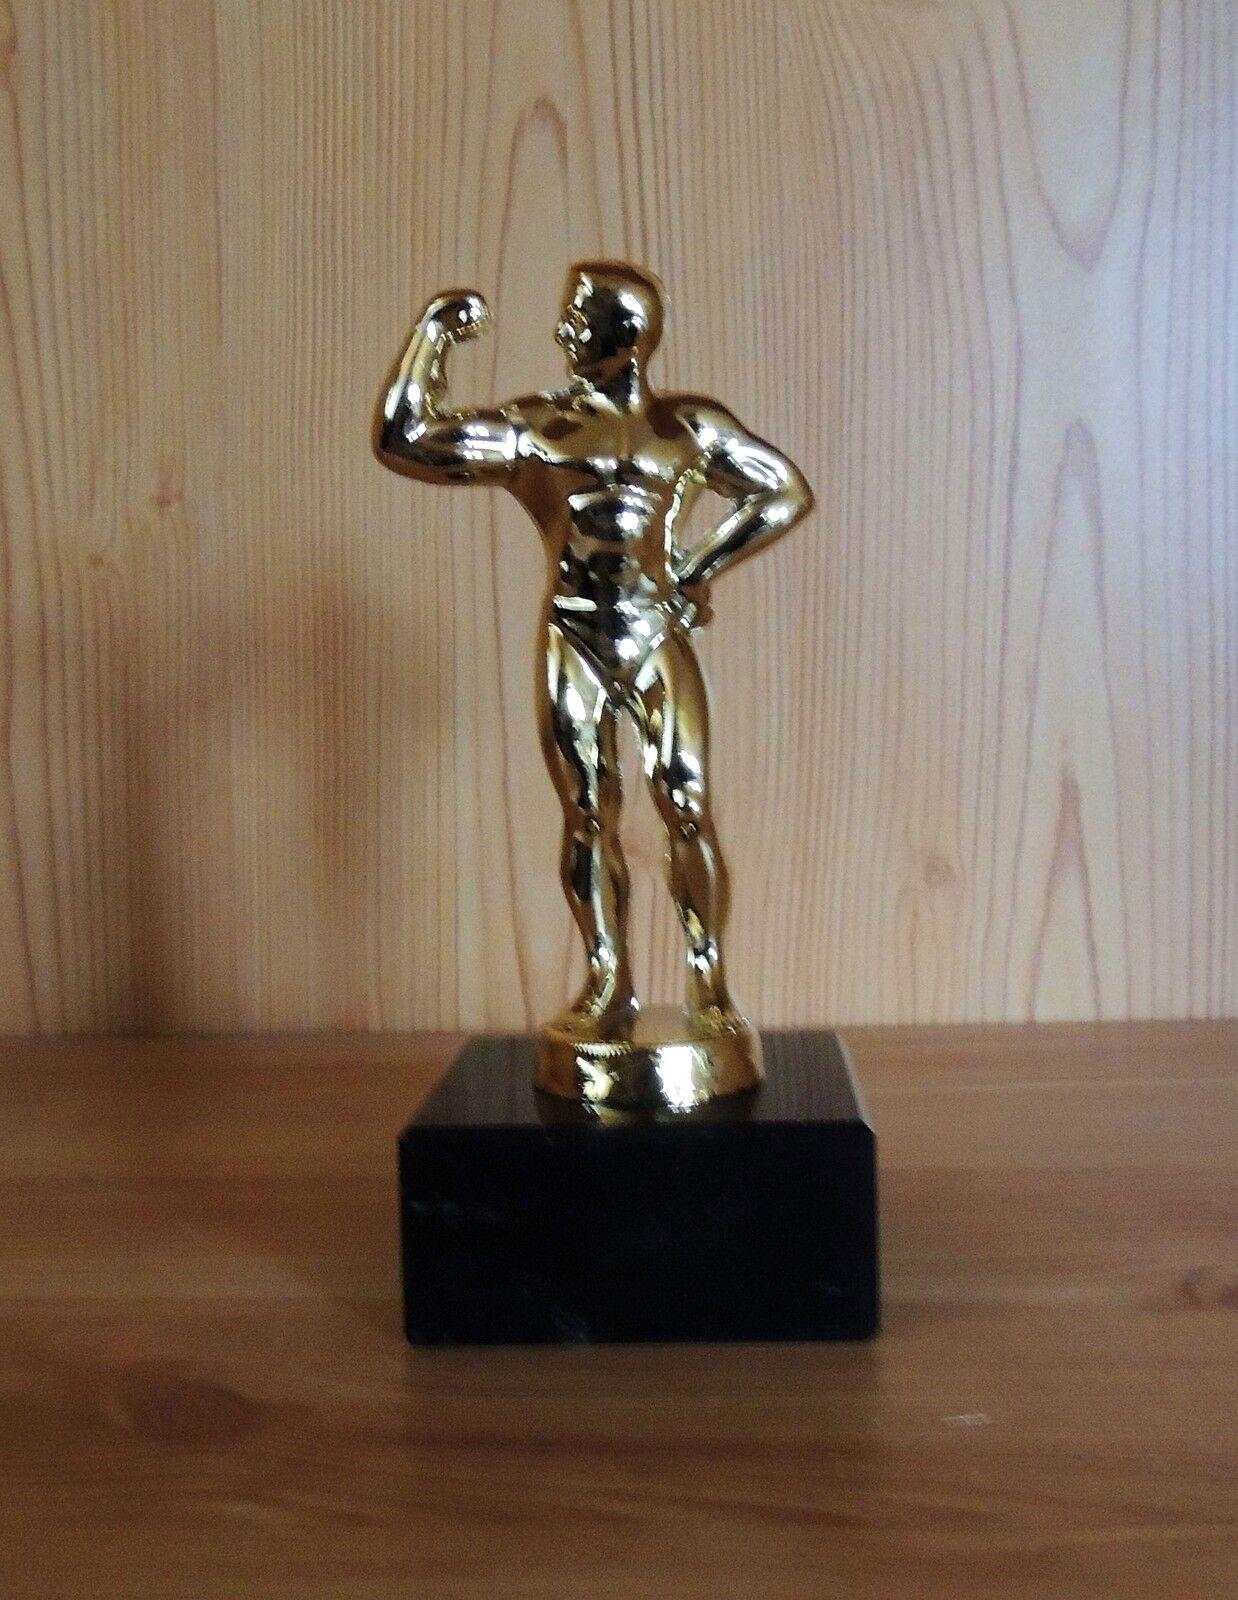 10 Bodybuilding Figuren aus Metall Adonis + Gravur Made in Germany Pokal Pokale